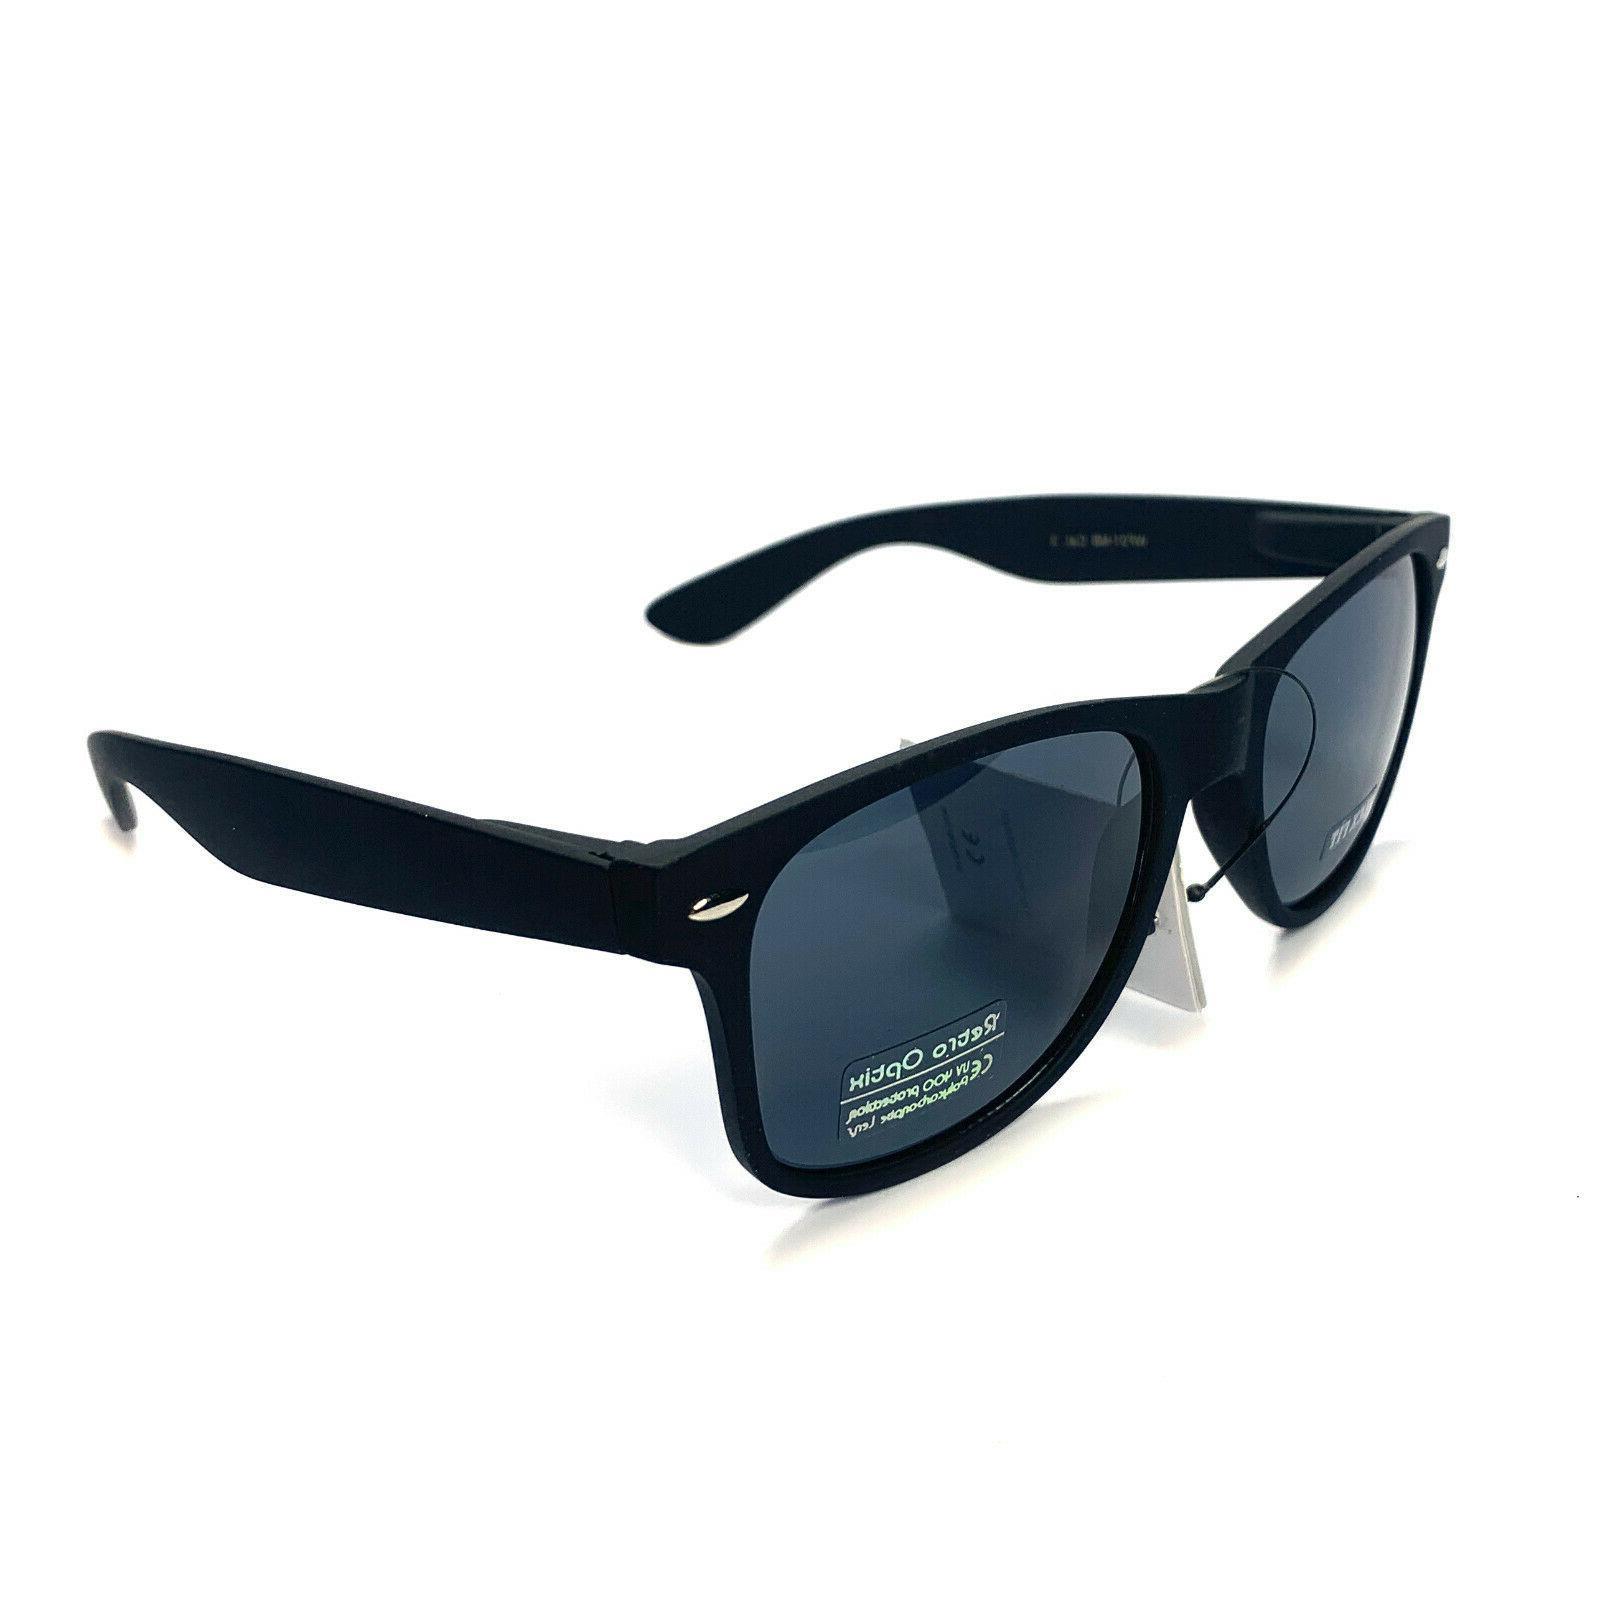 Retro Style Sunglasses - 1